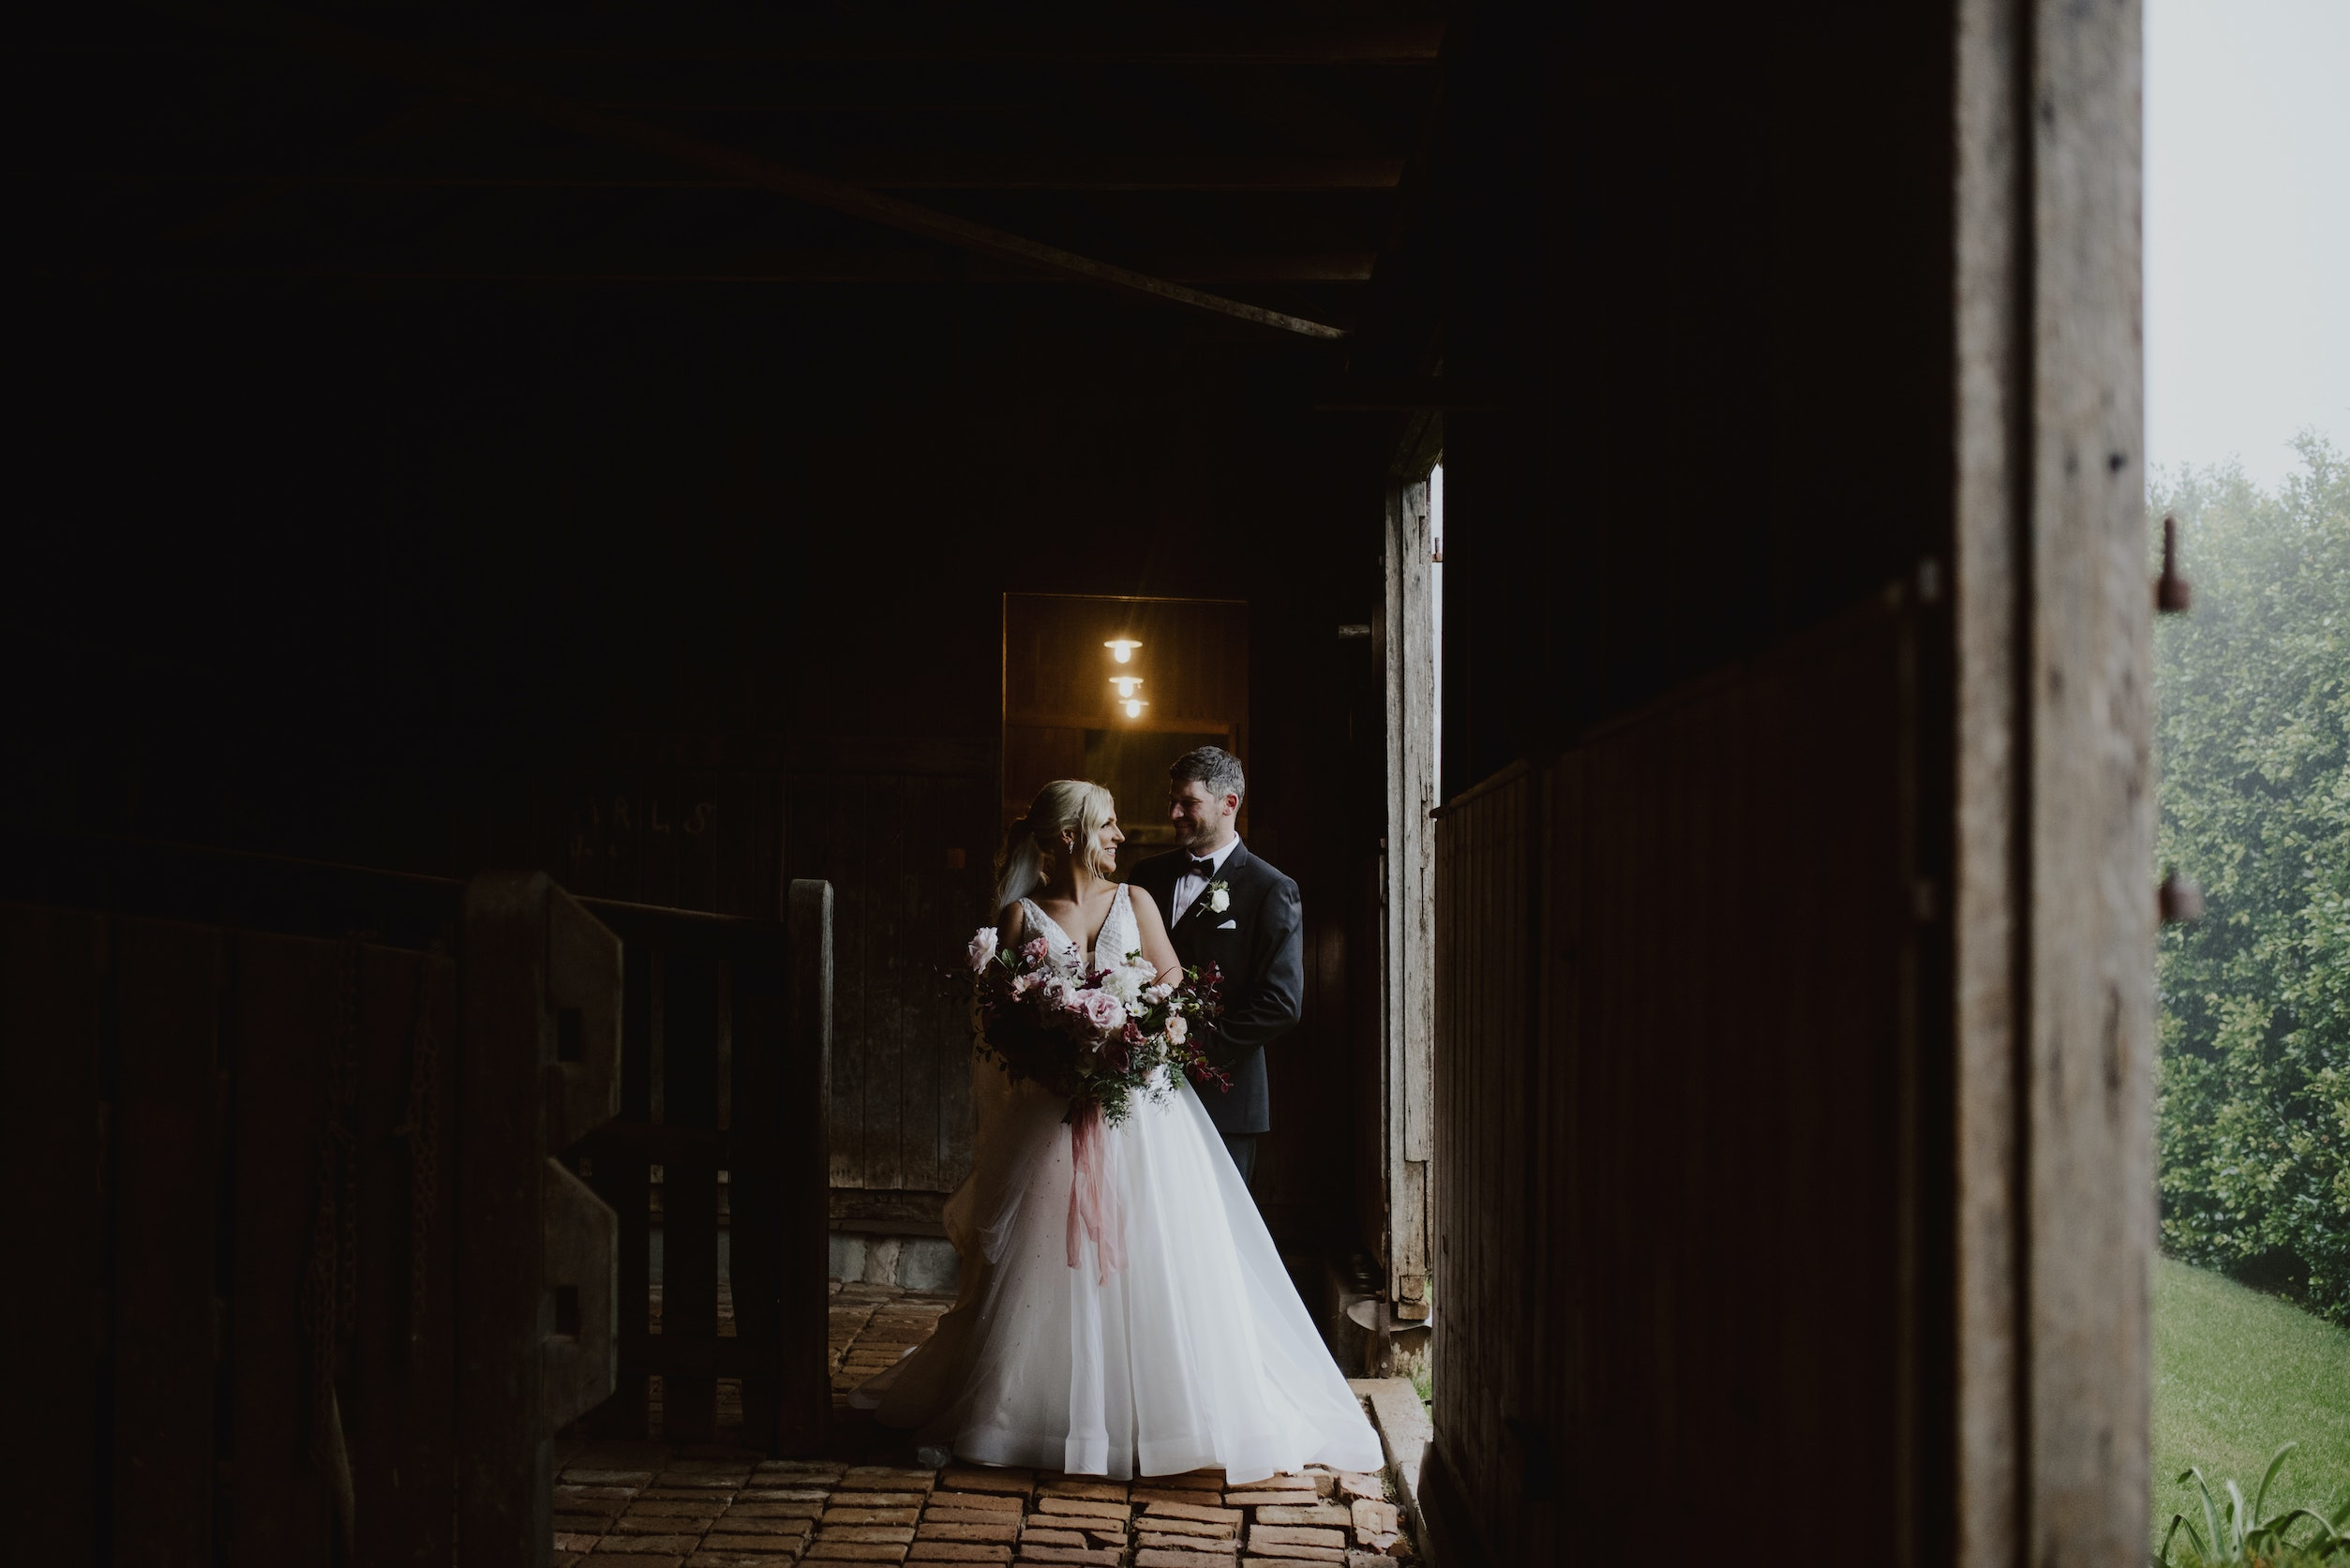 Bride and groom posing in rustic stables